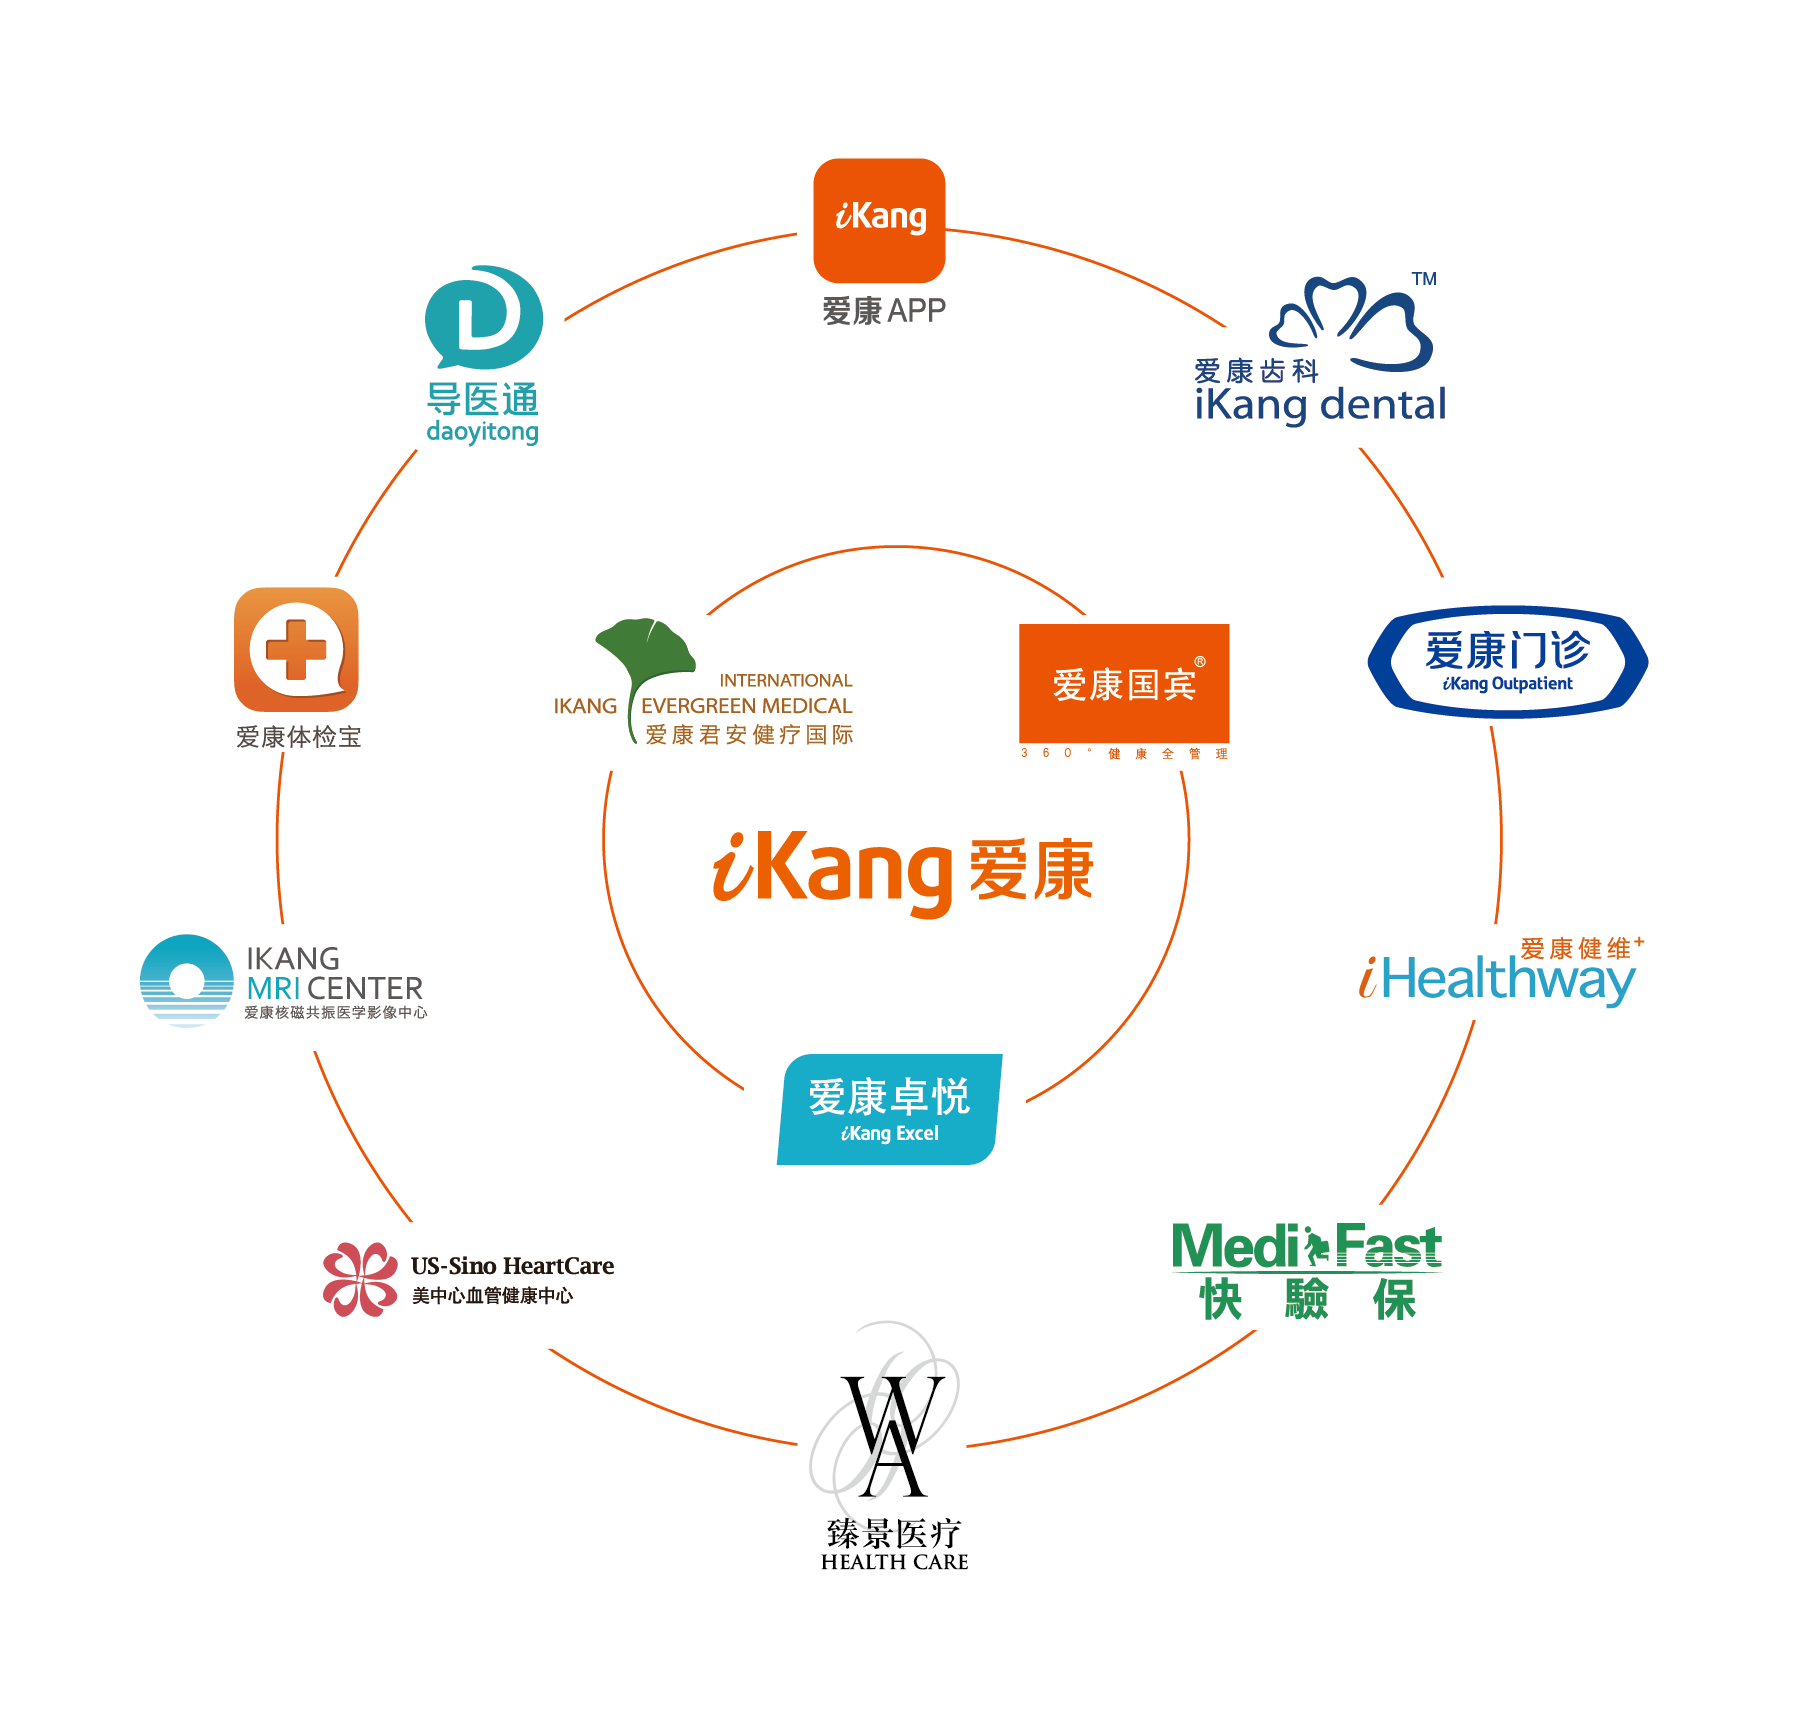 集团环形logo.png